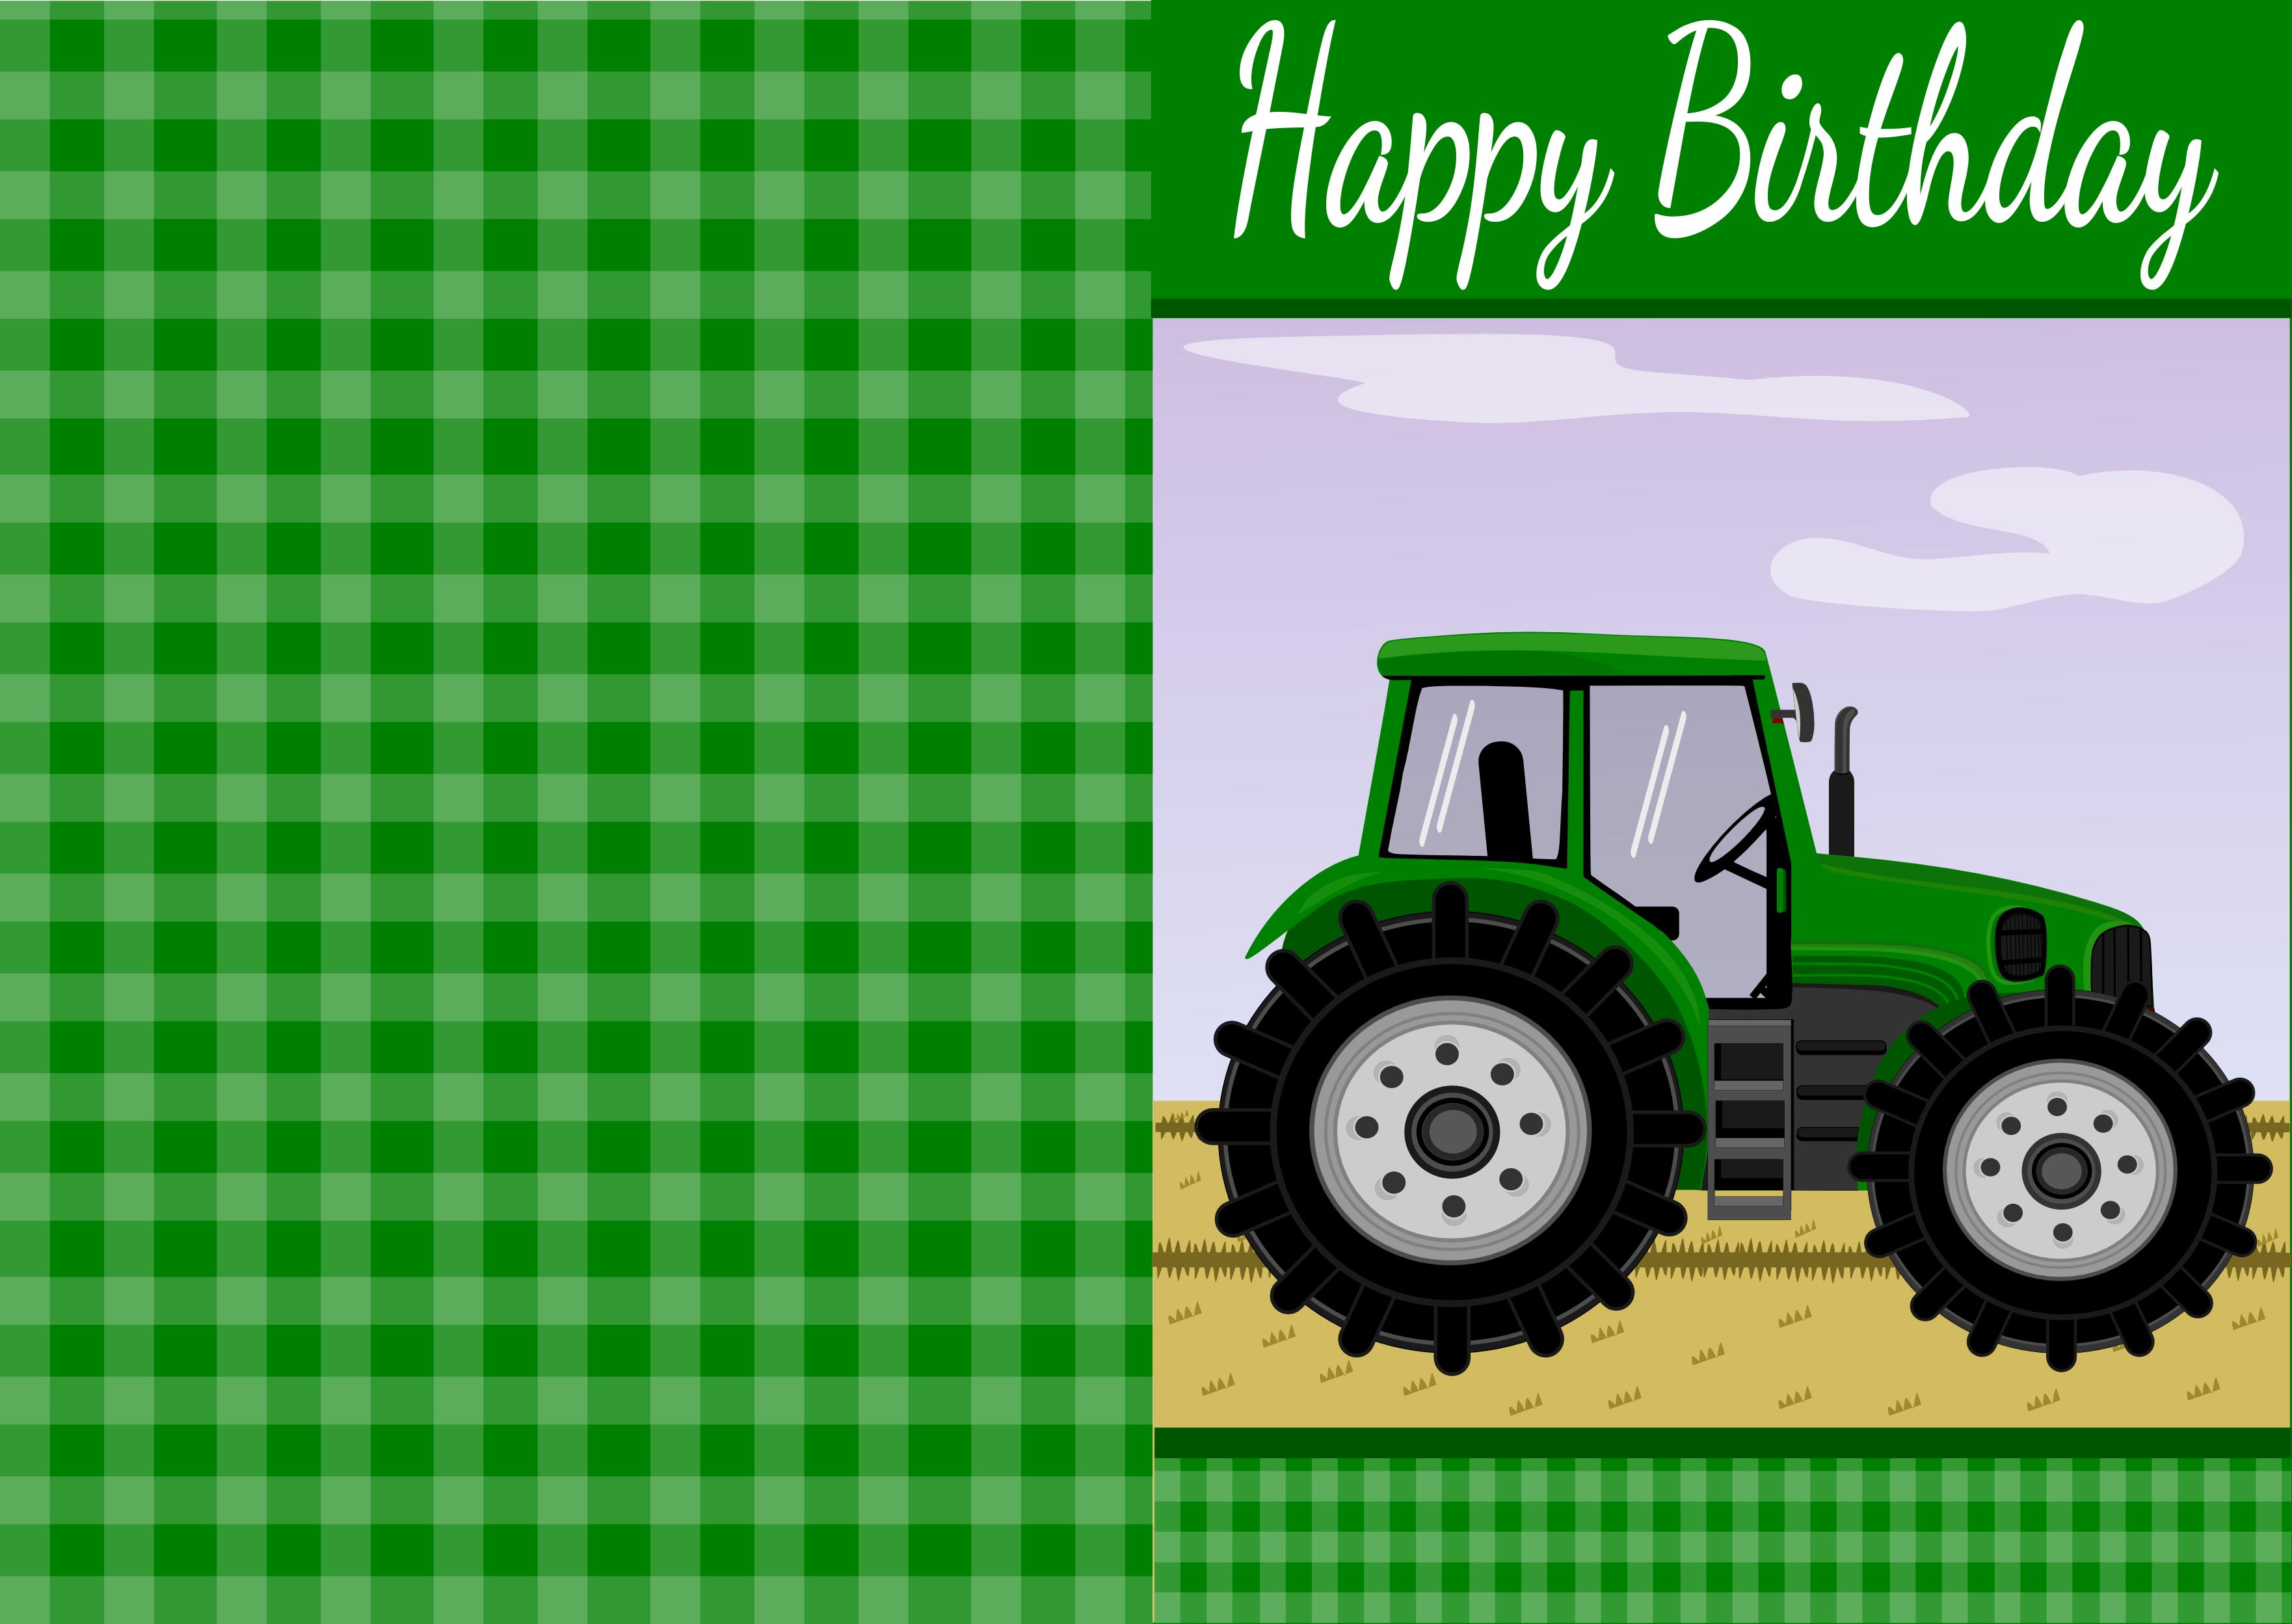 Printable Cards   Party Ideas   Free Printable Birthday Cards, Free - Free Printable John Deere Food Labels